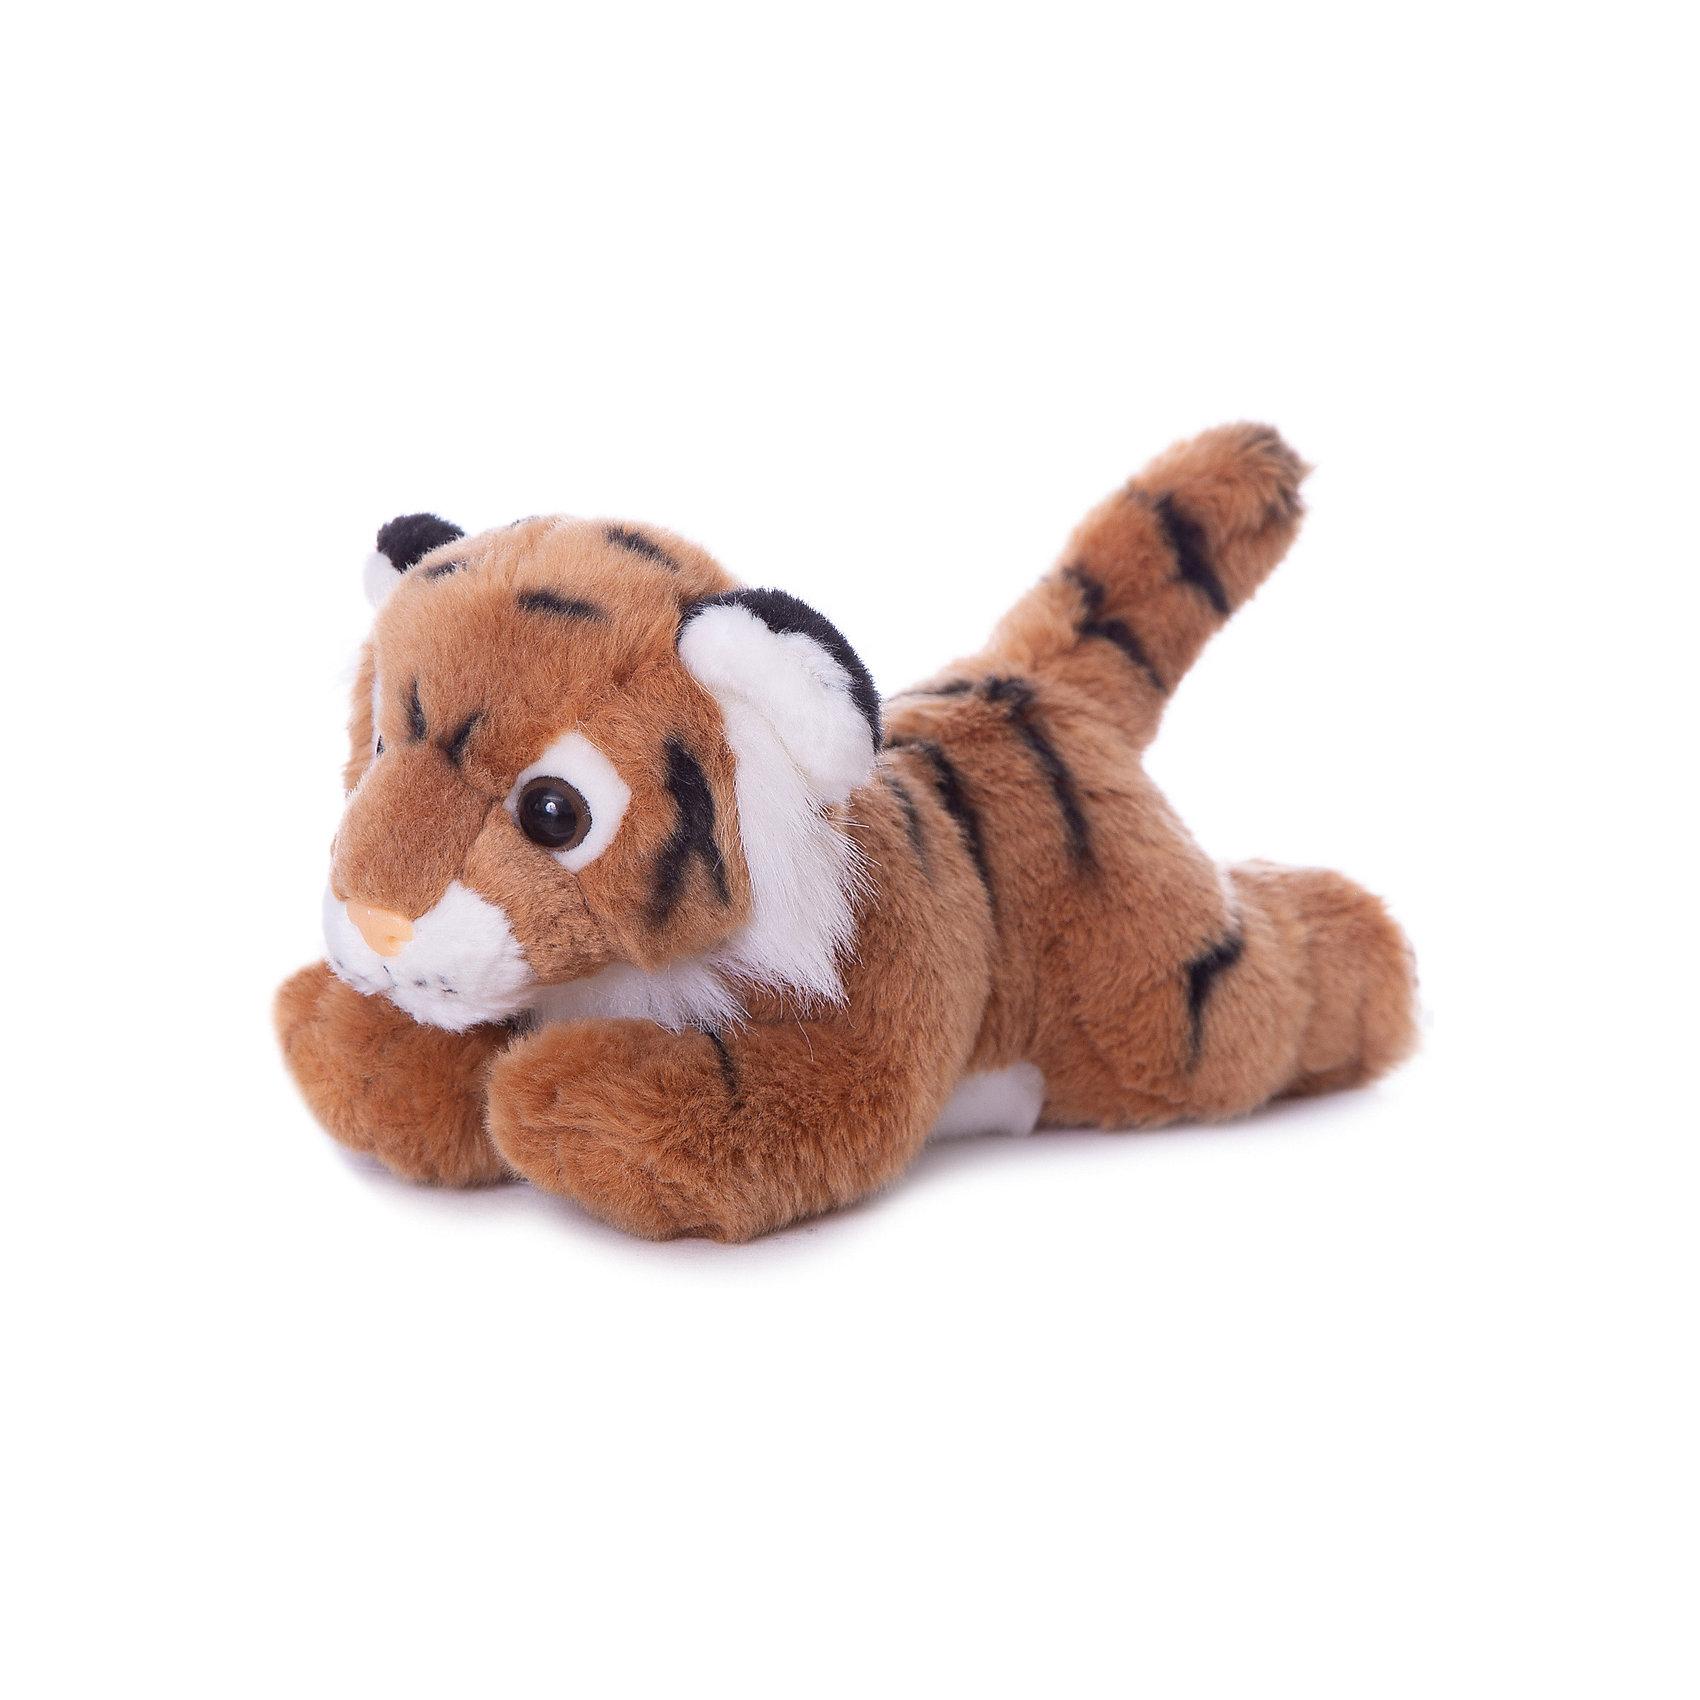 AURORA Мягкая игрушка Тигр коричневый, 28 см, AURORA aurora мягкая игрушка тигр 28 см